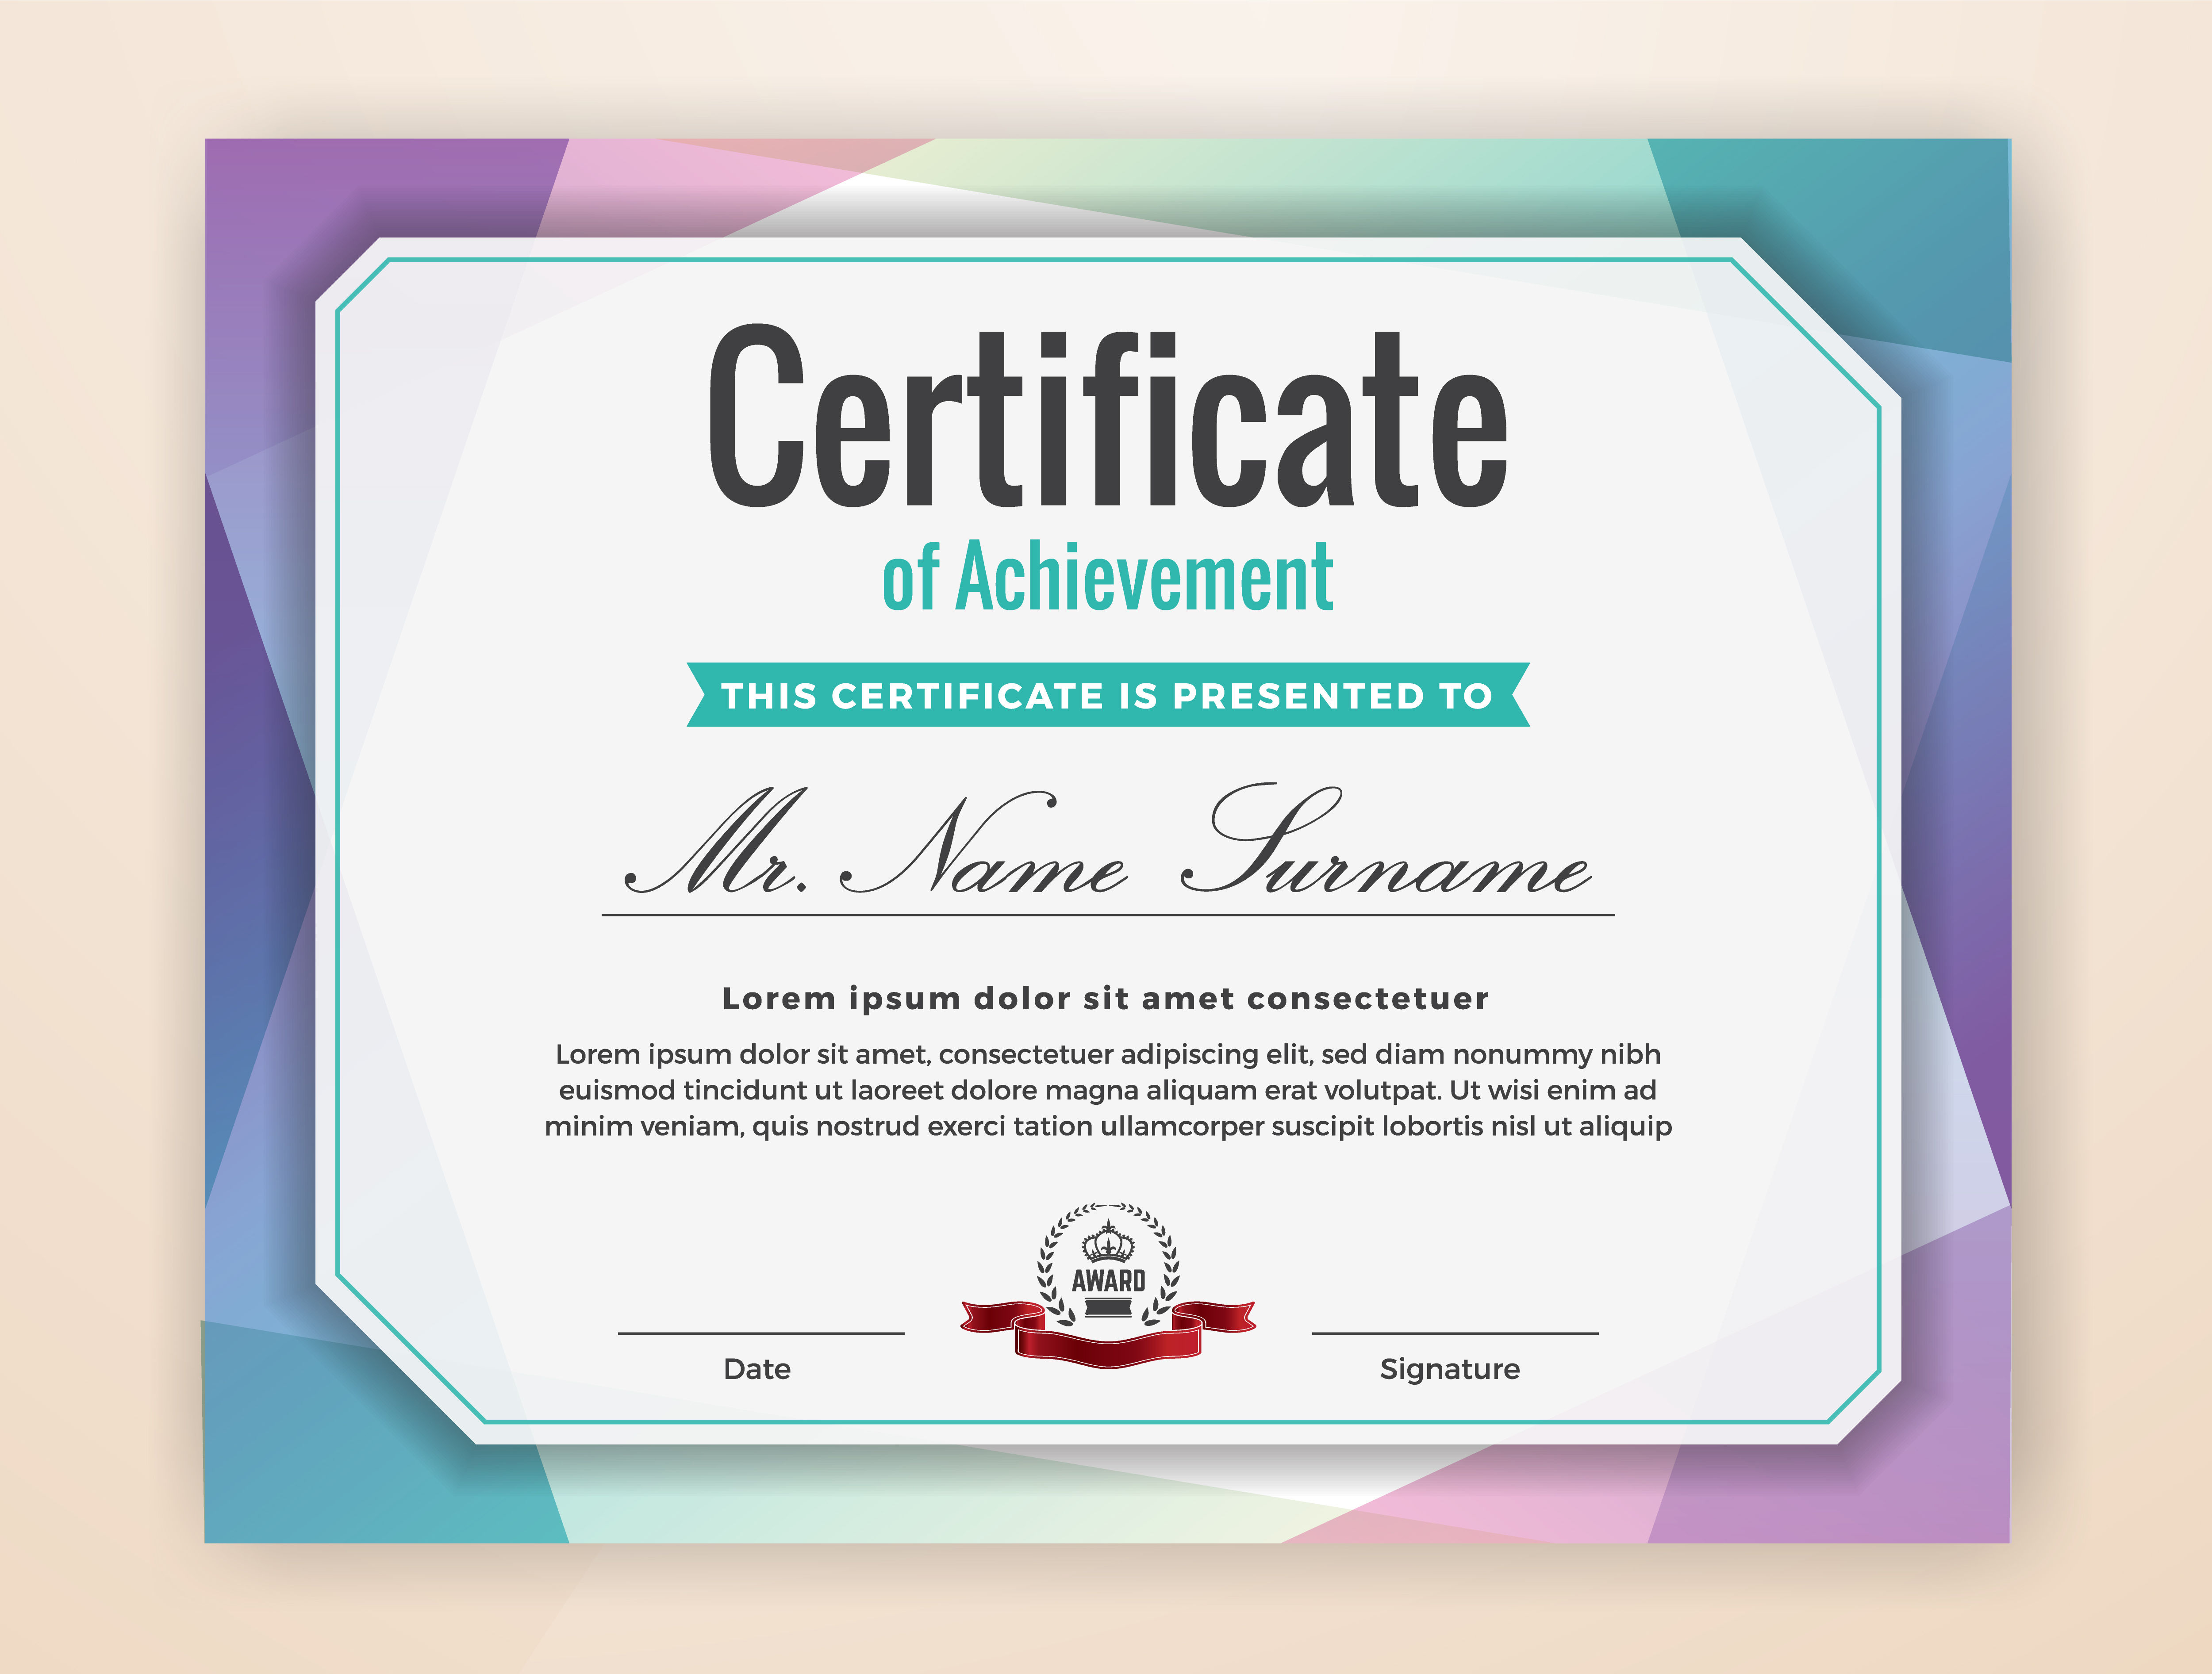 certificate borders free vector art 4475 free downloads